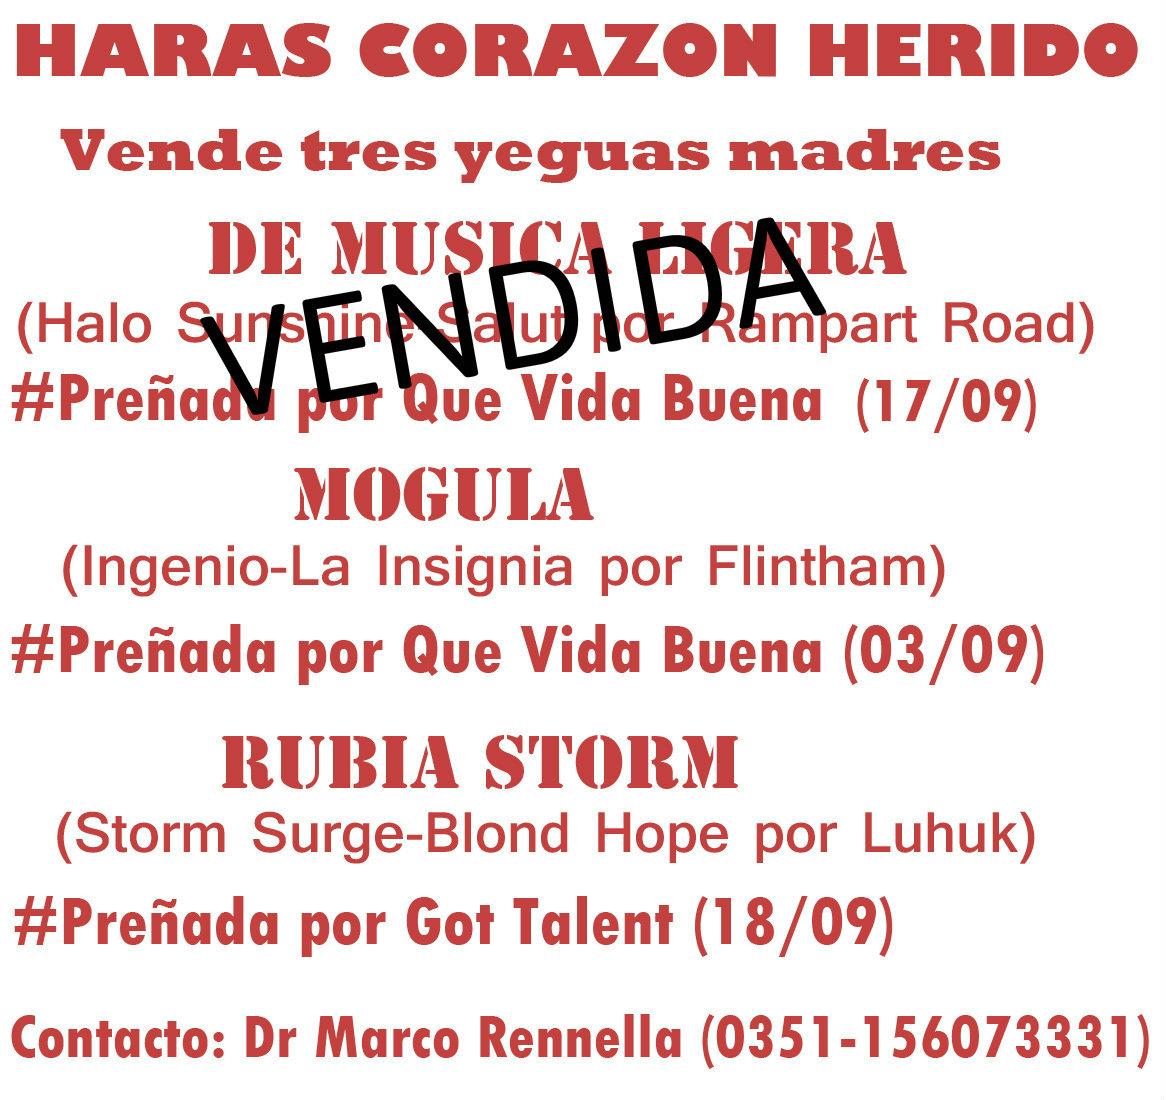 HS CORAZON HERIDO